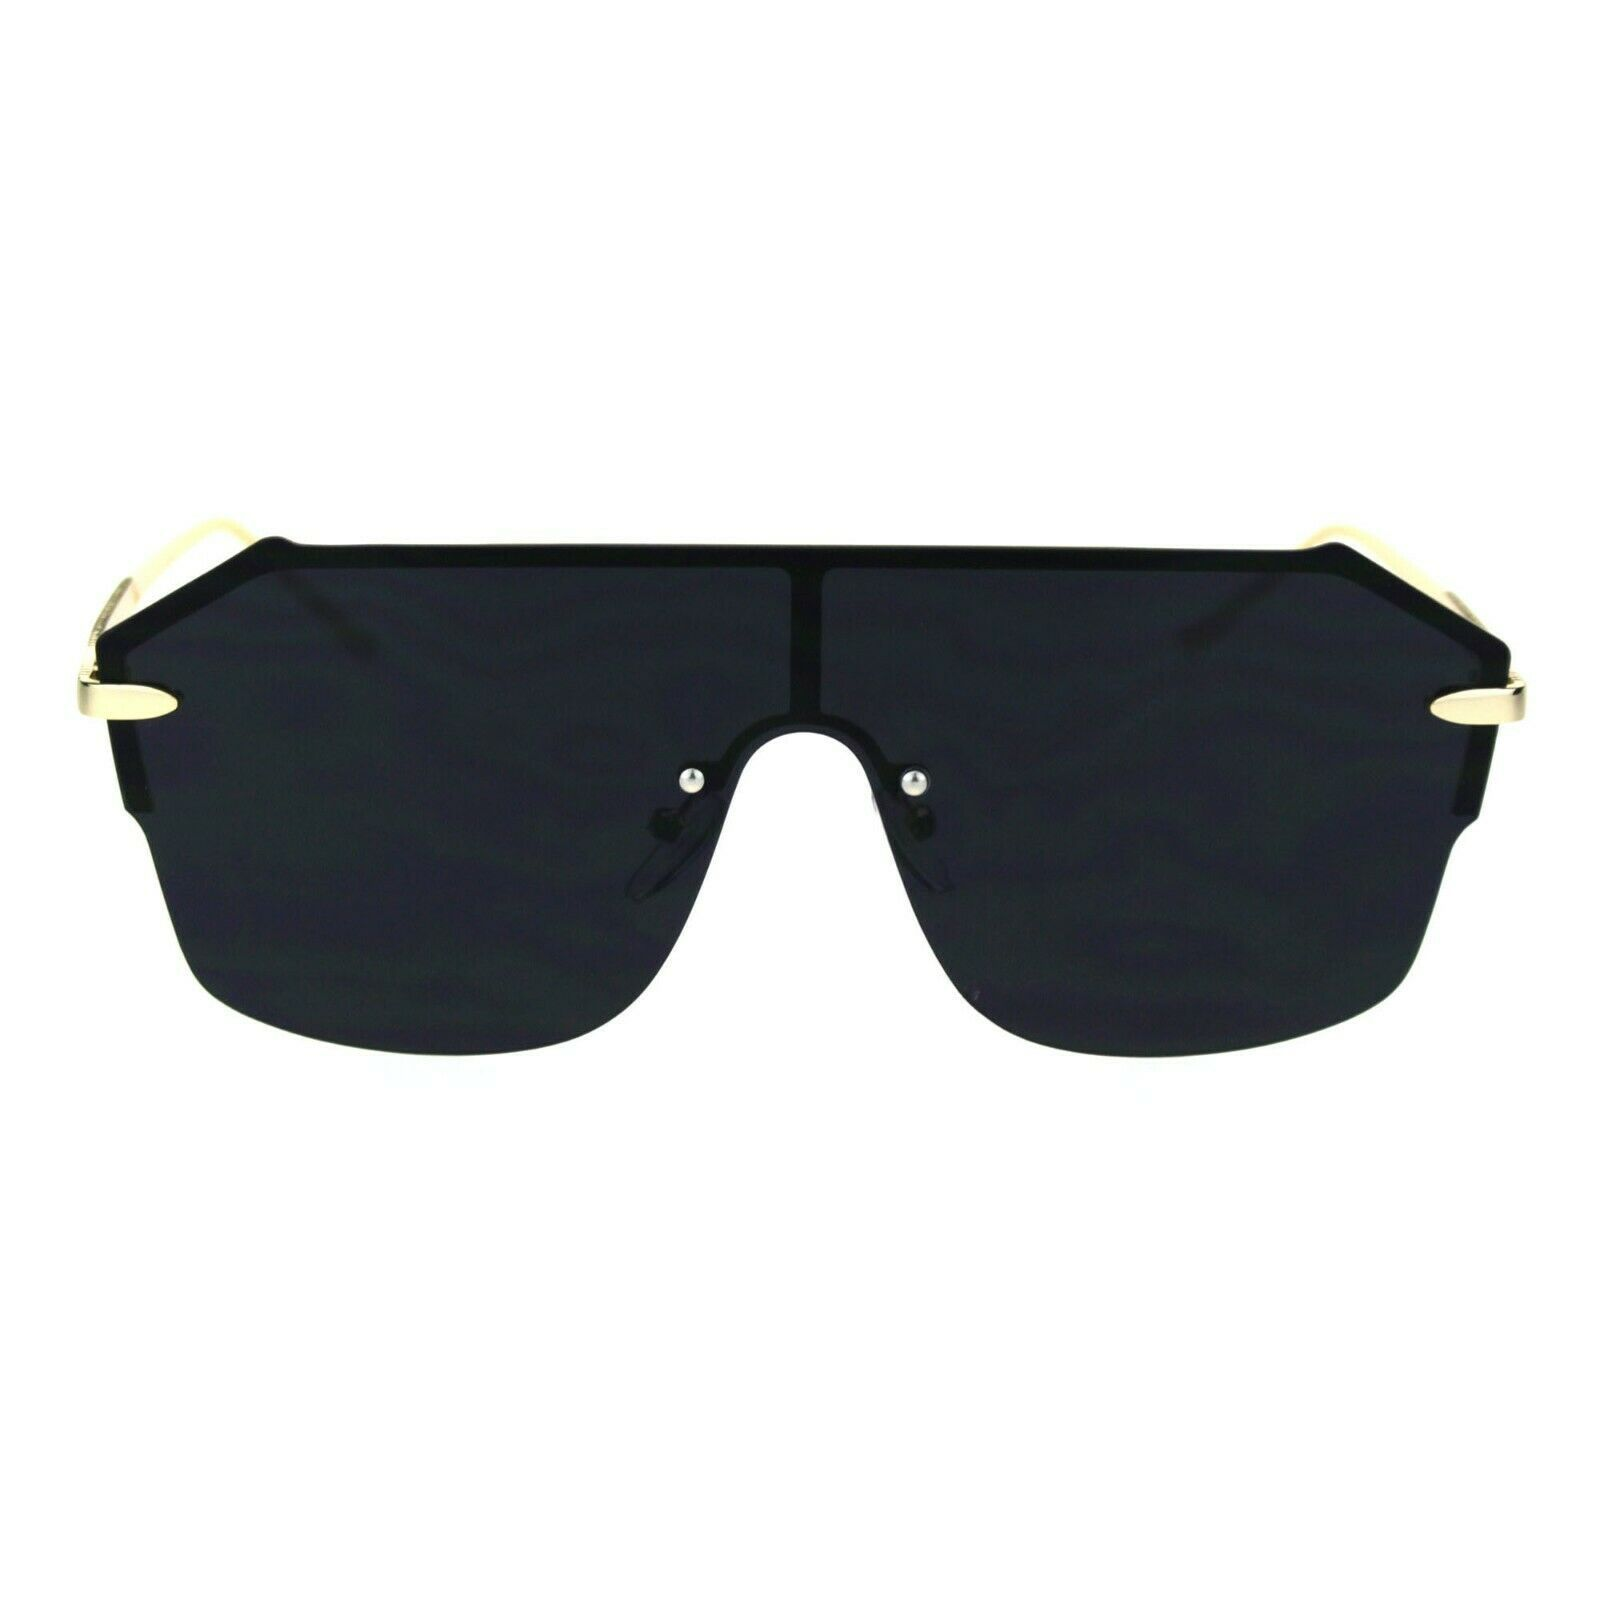 Womens Rimless Style Sunglasses Trendy Chic Mono Lens Shades UV 400